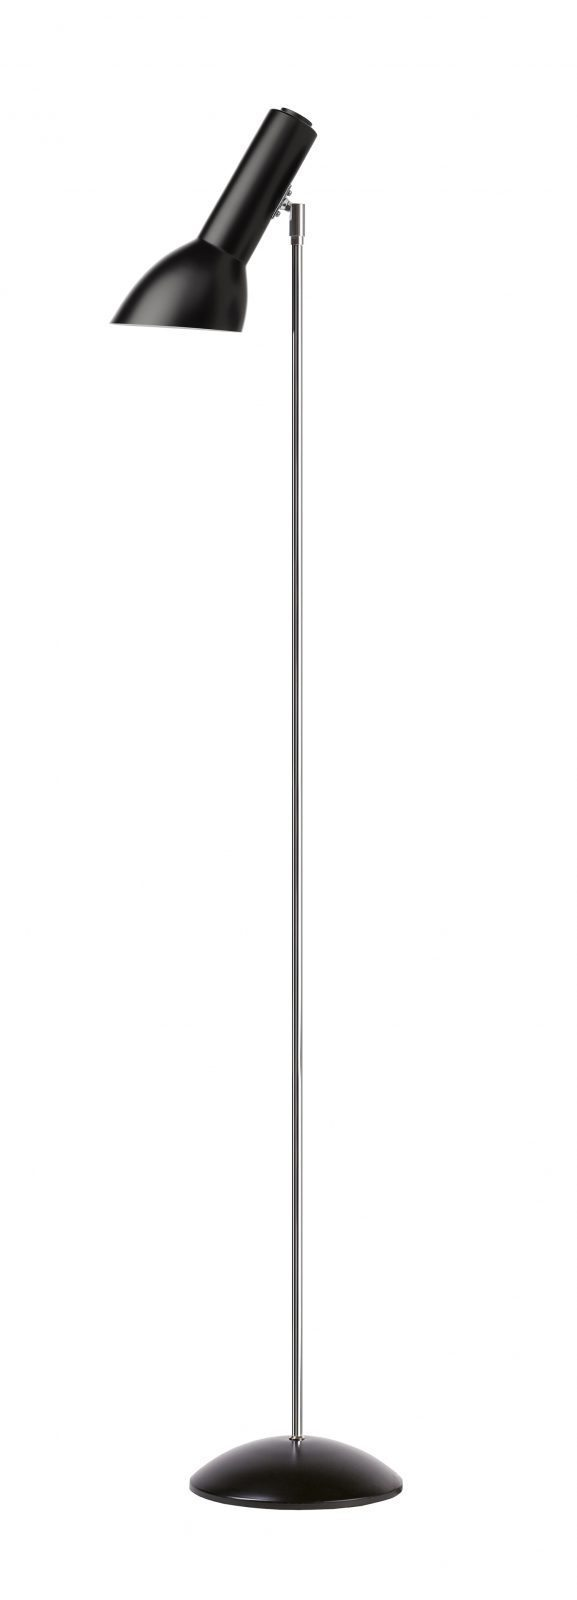 CPH Lighting Oblique Stehleuchte